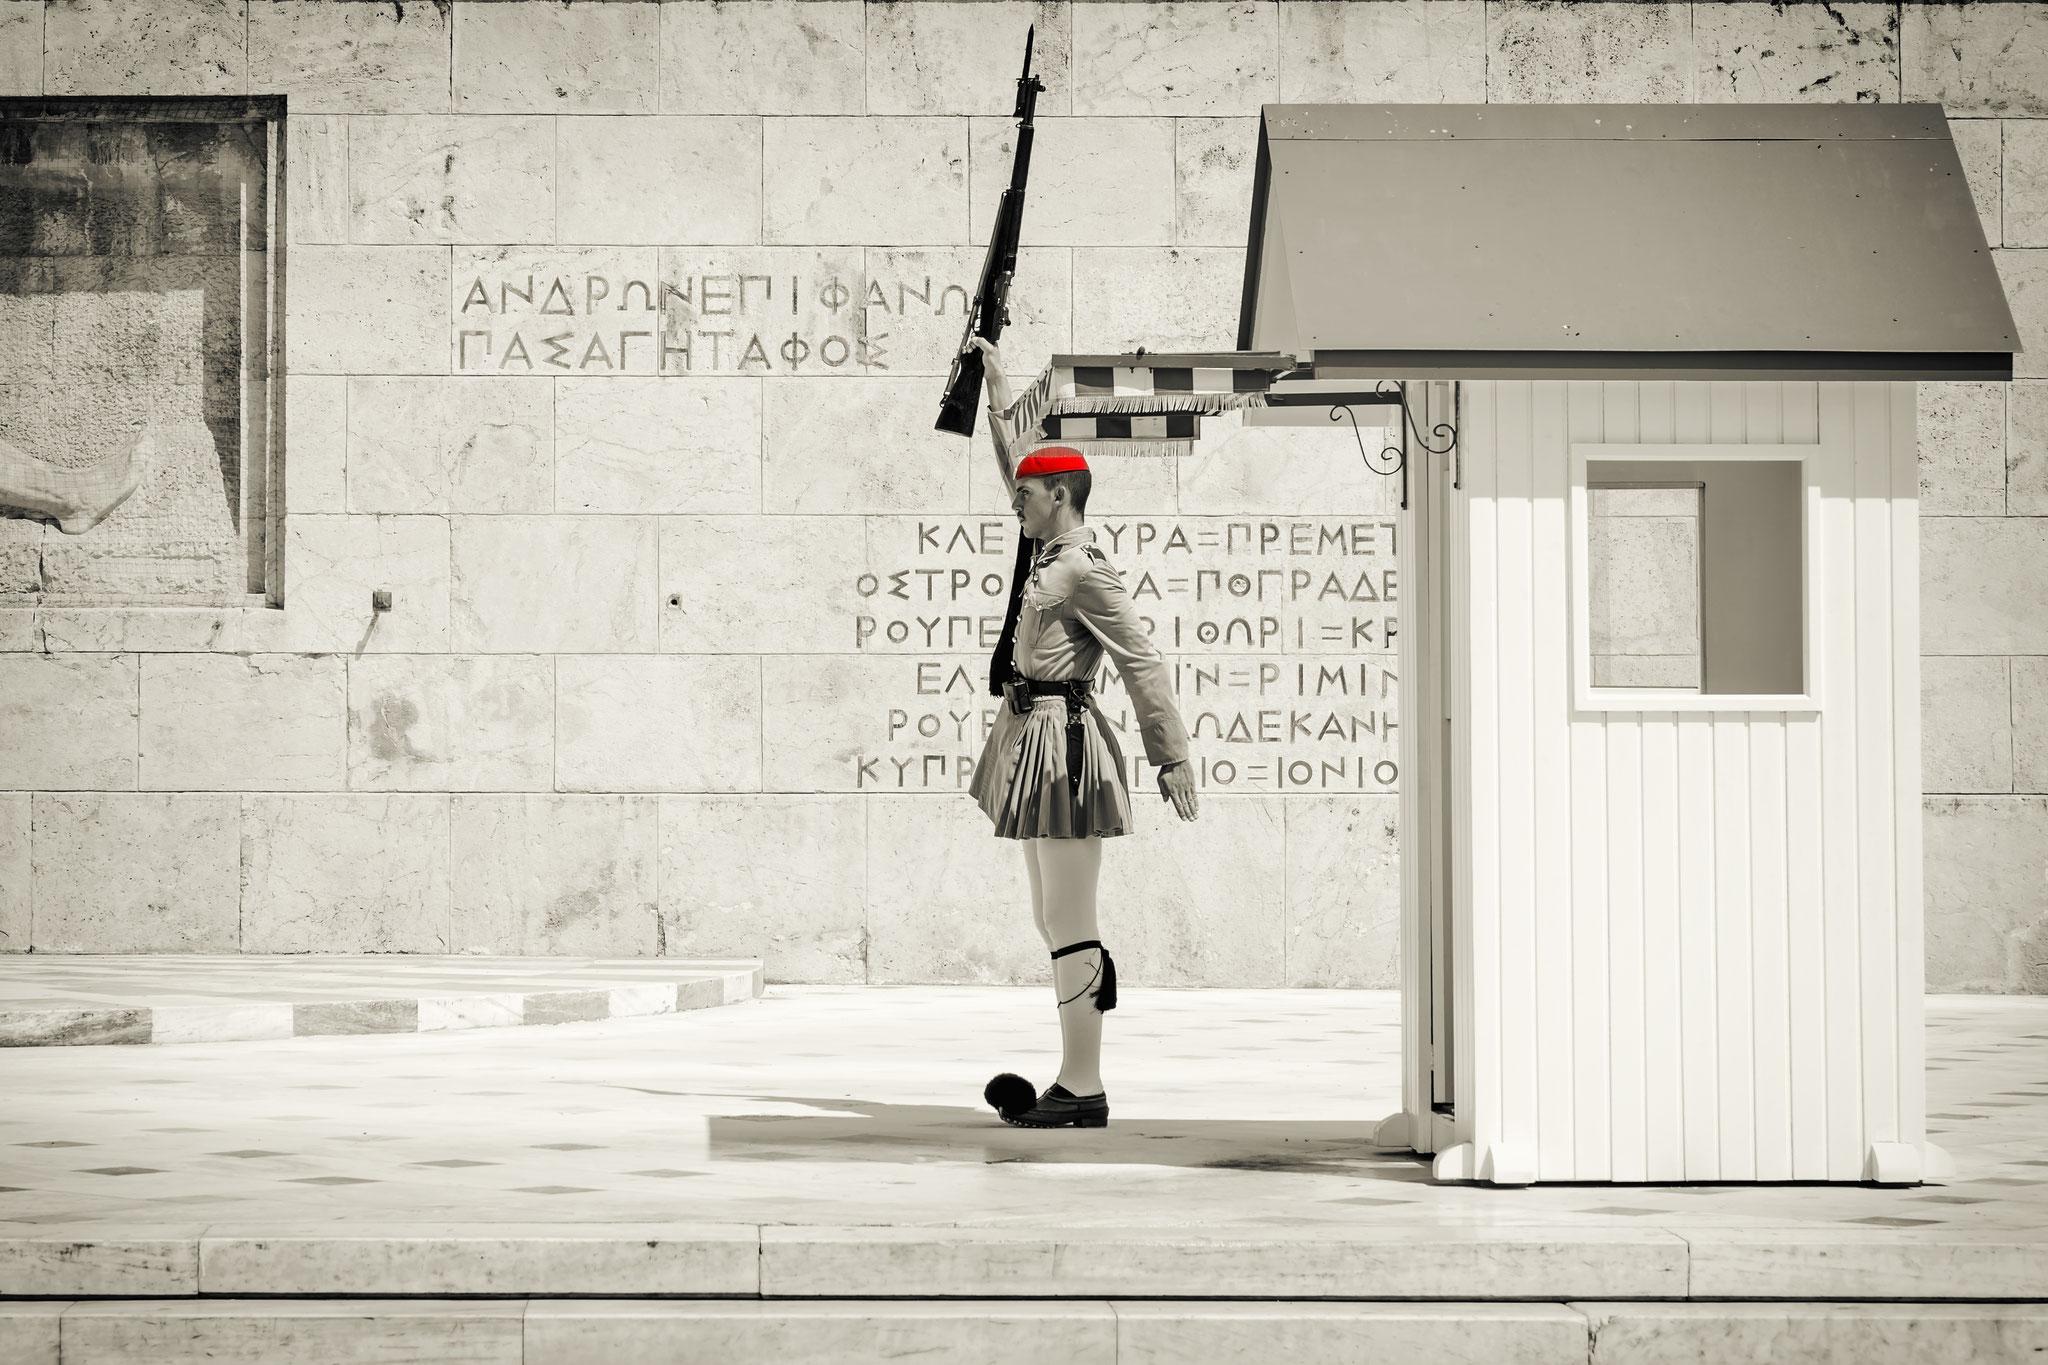 037-Ahmed Abdel HAMID (Alexandria-Egyt) - Athens (GR)